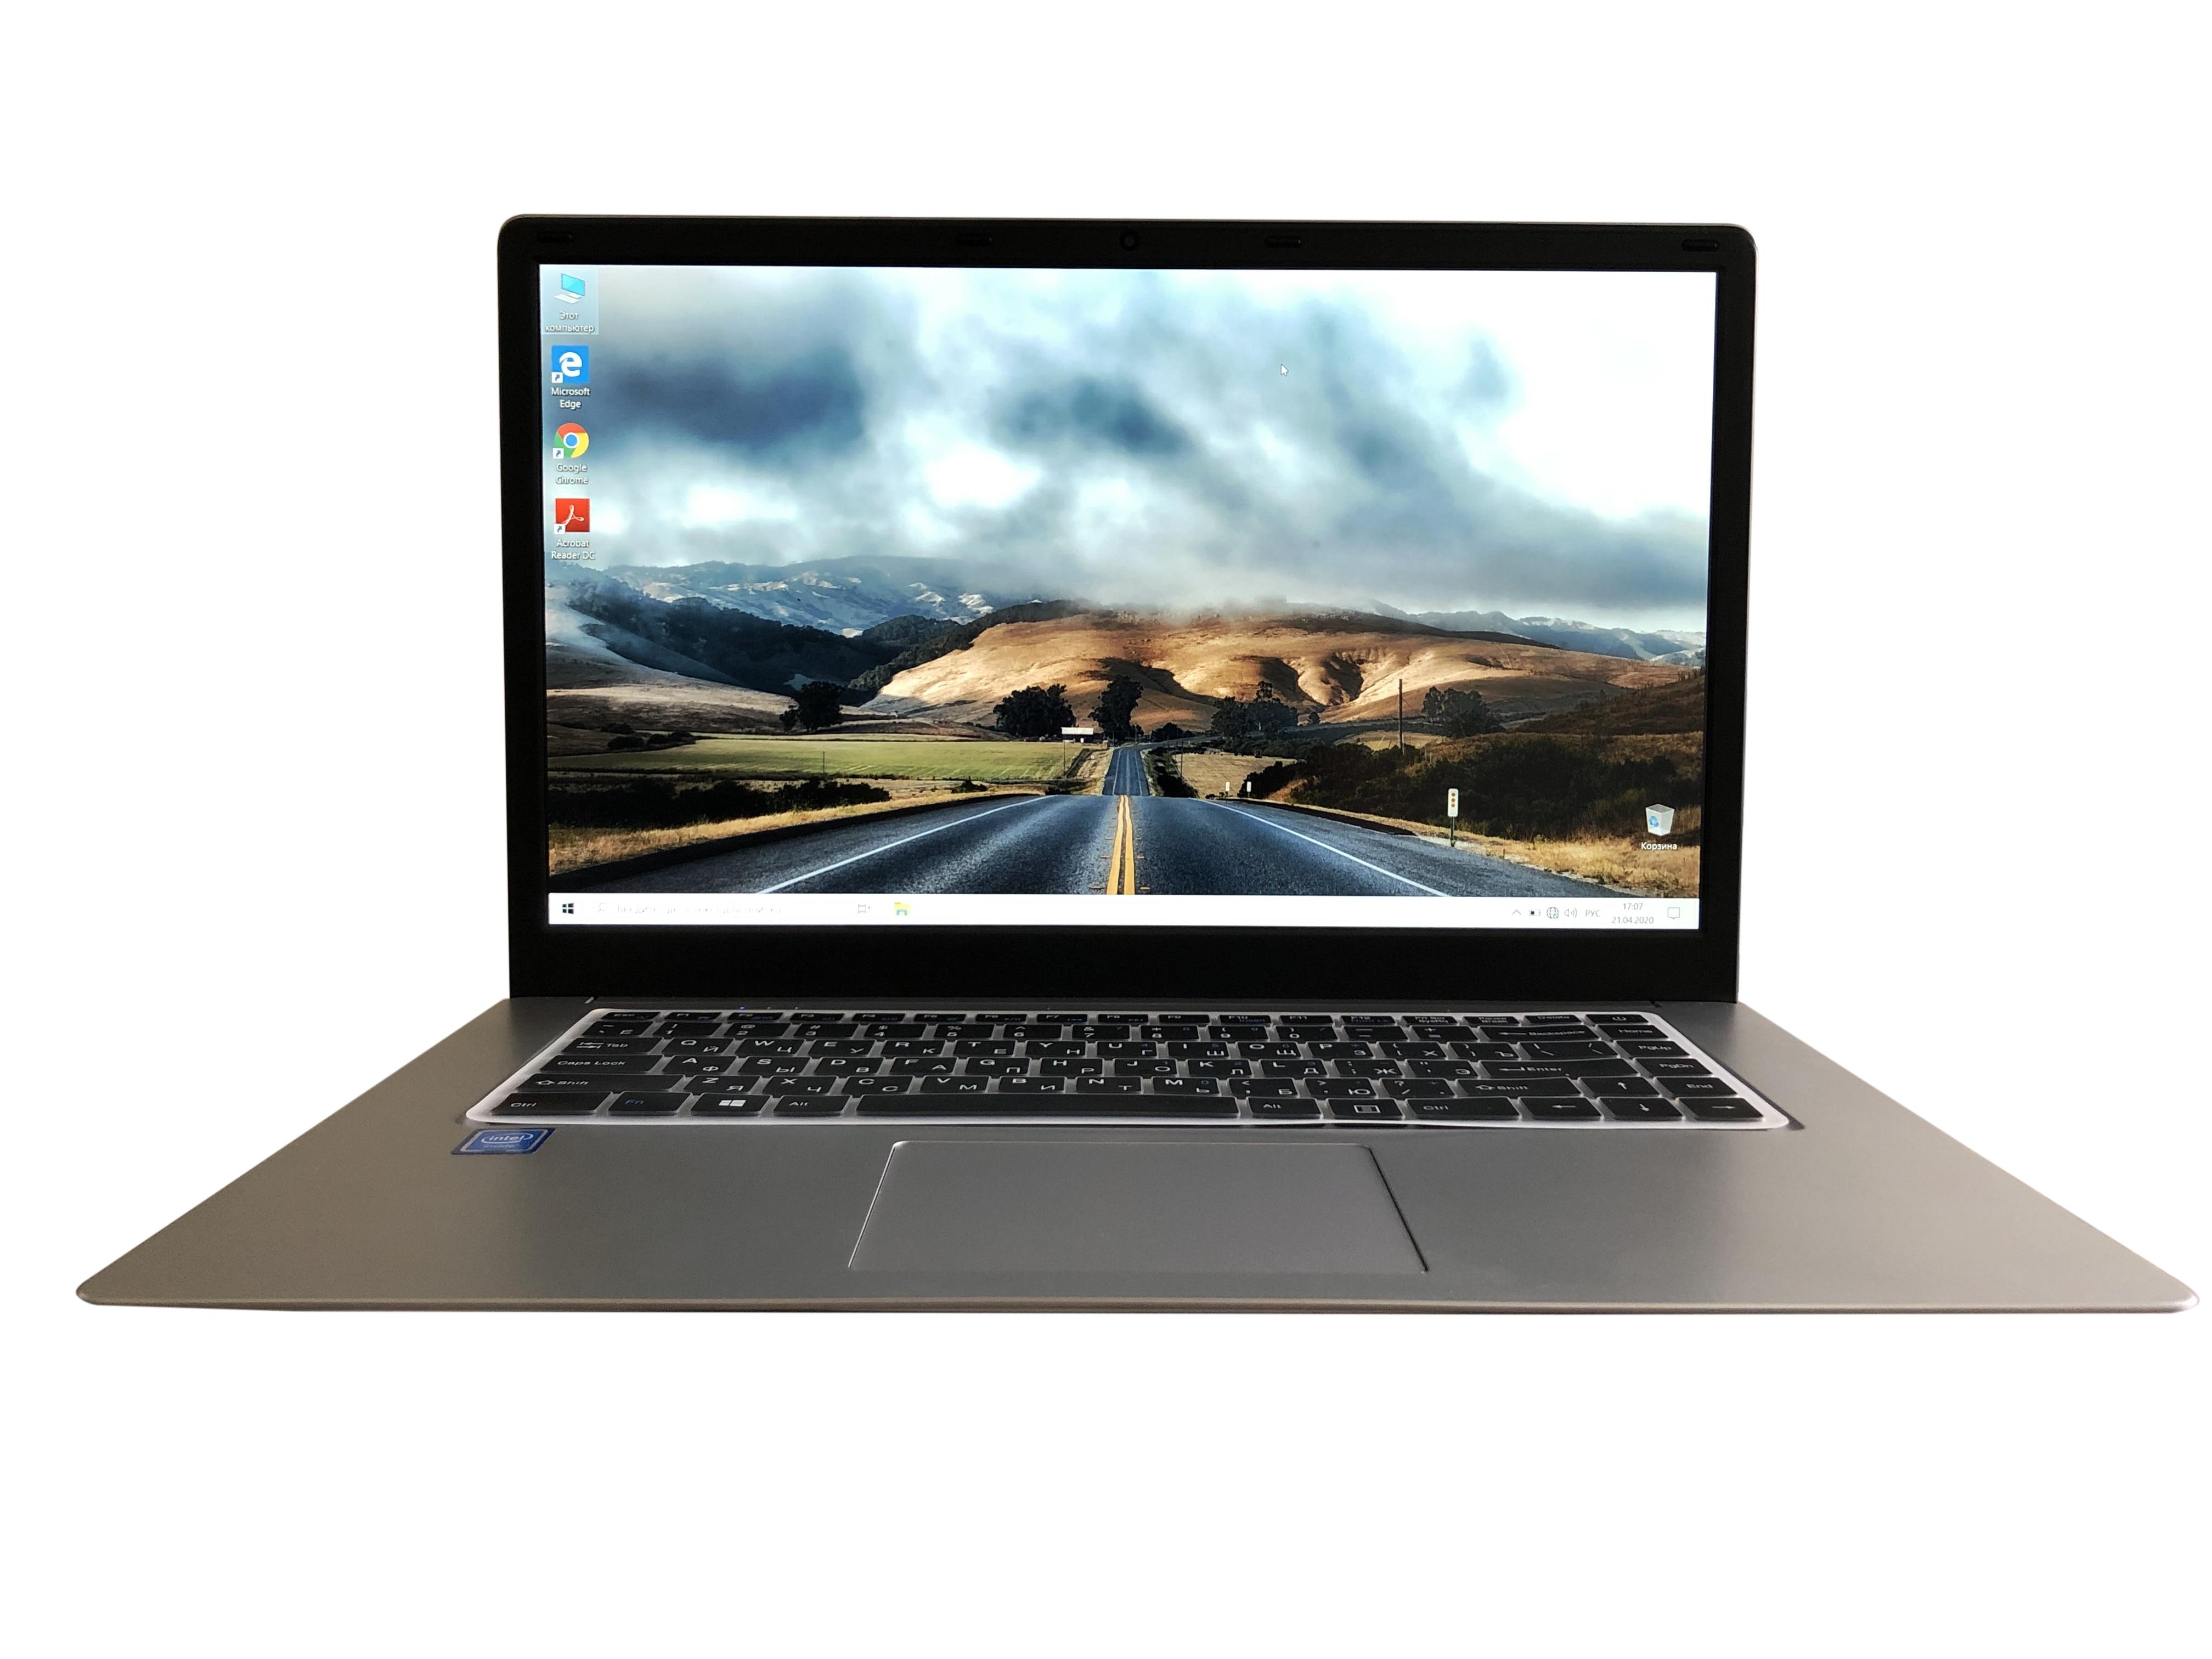 "Ноутбук Echips Casual Slim 15.6"" 1920x1080 IPS, Intel Celeron J3455 4x2.3Ghz, 8GB RAM, SSD 240Gb [DOS]"